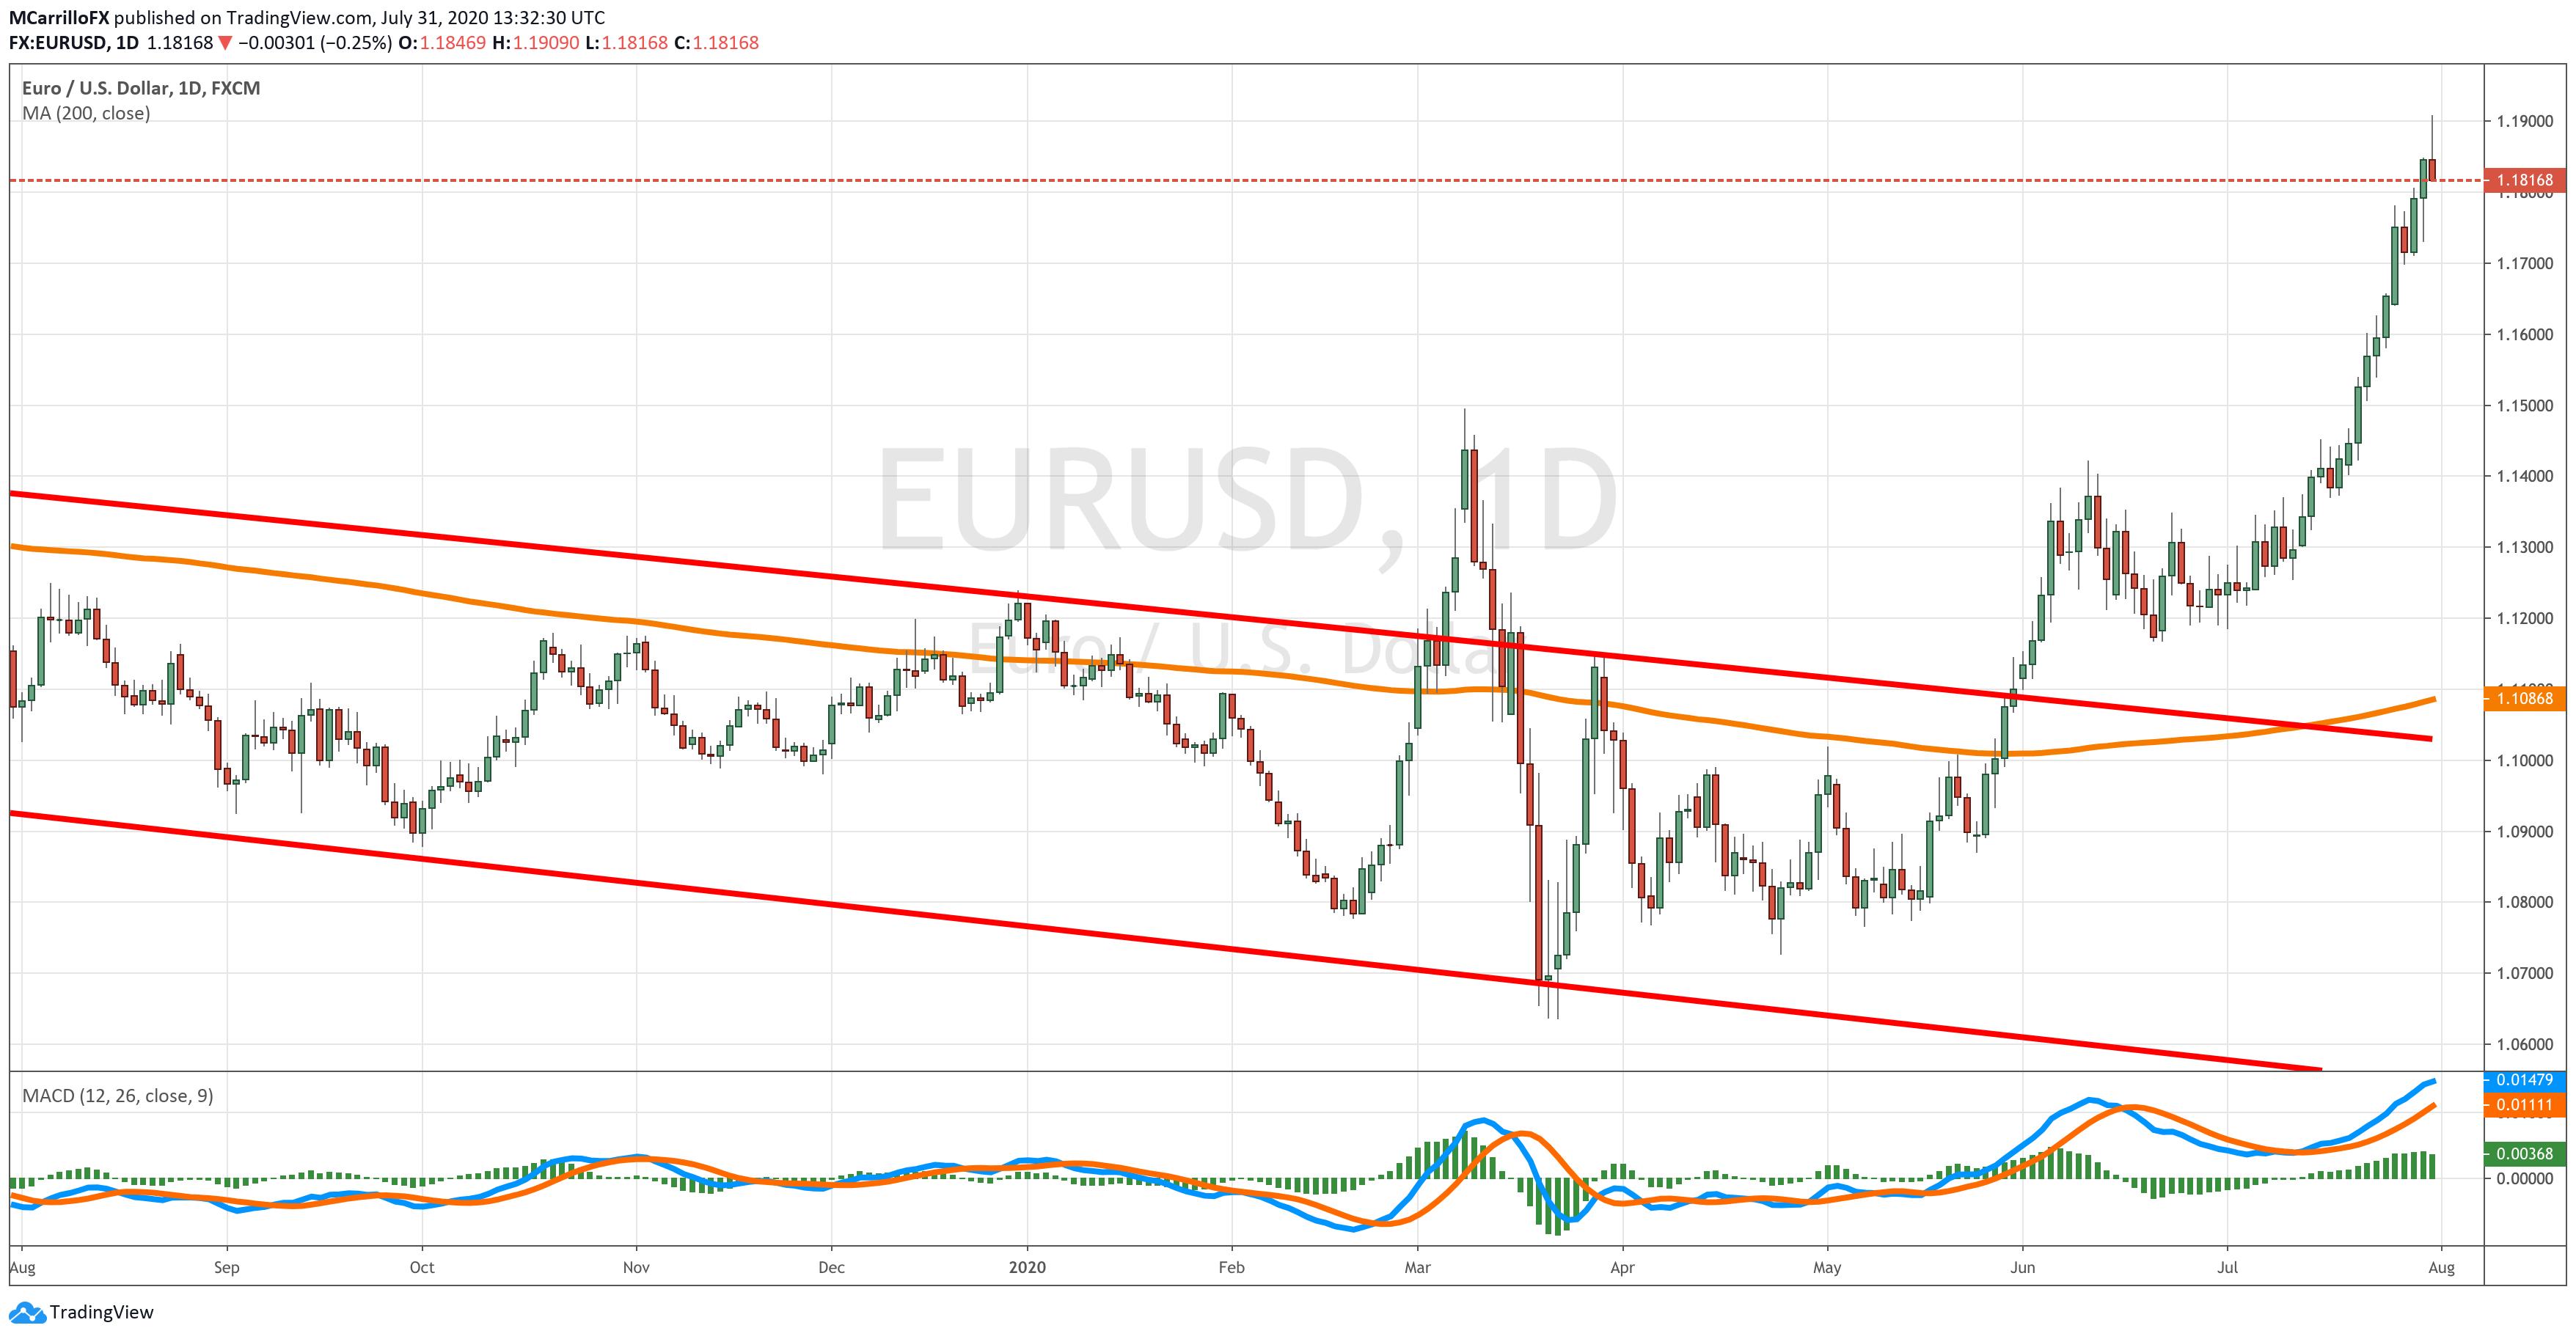 EURUSD chart diario julio 31